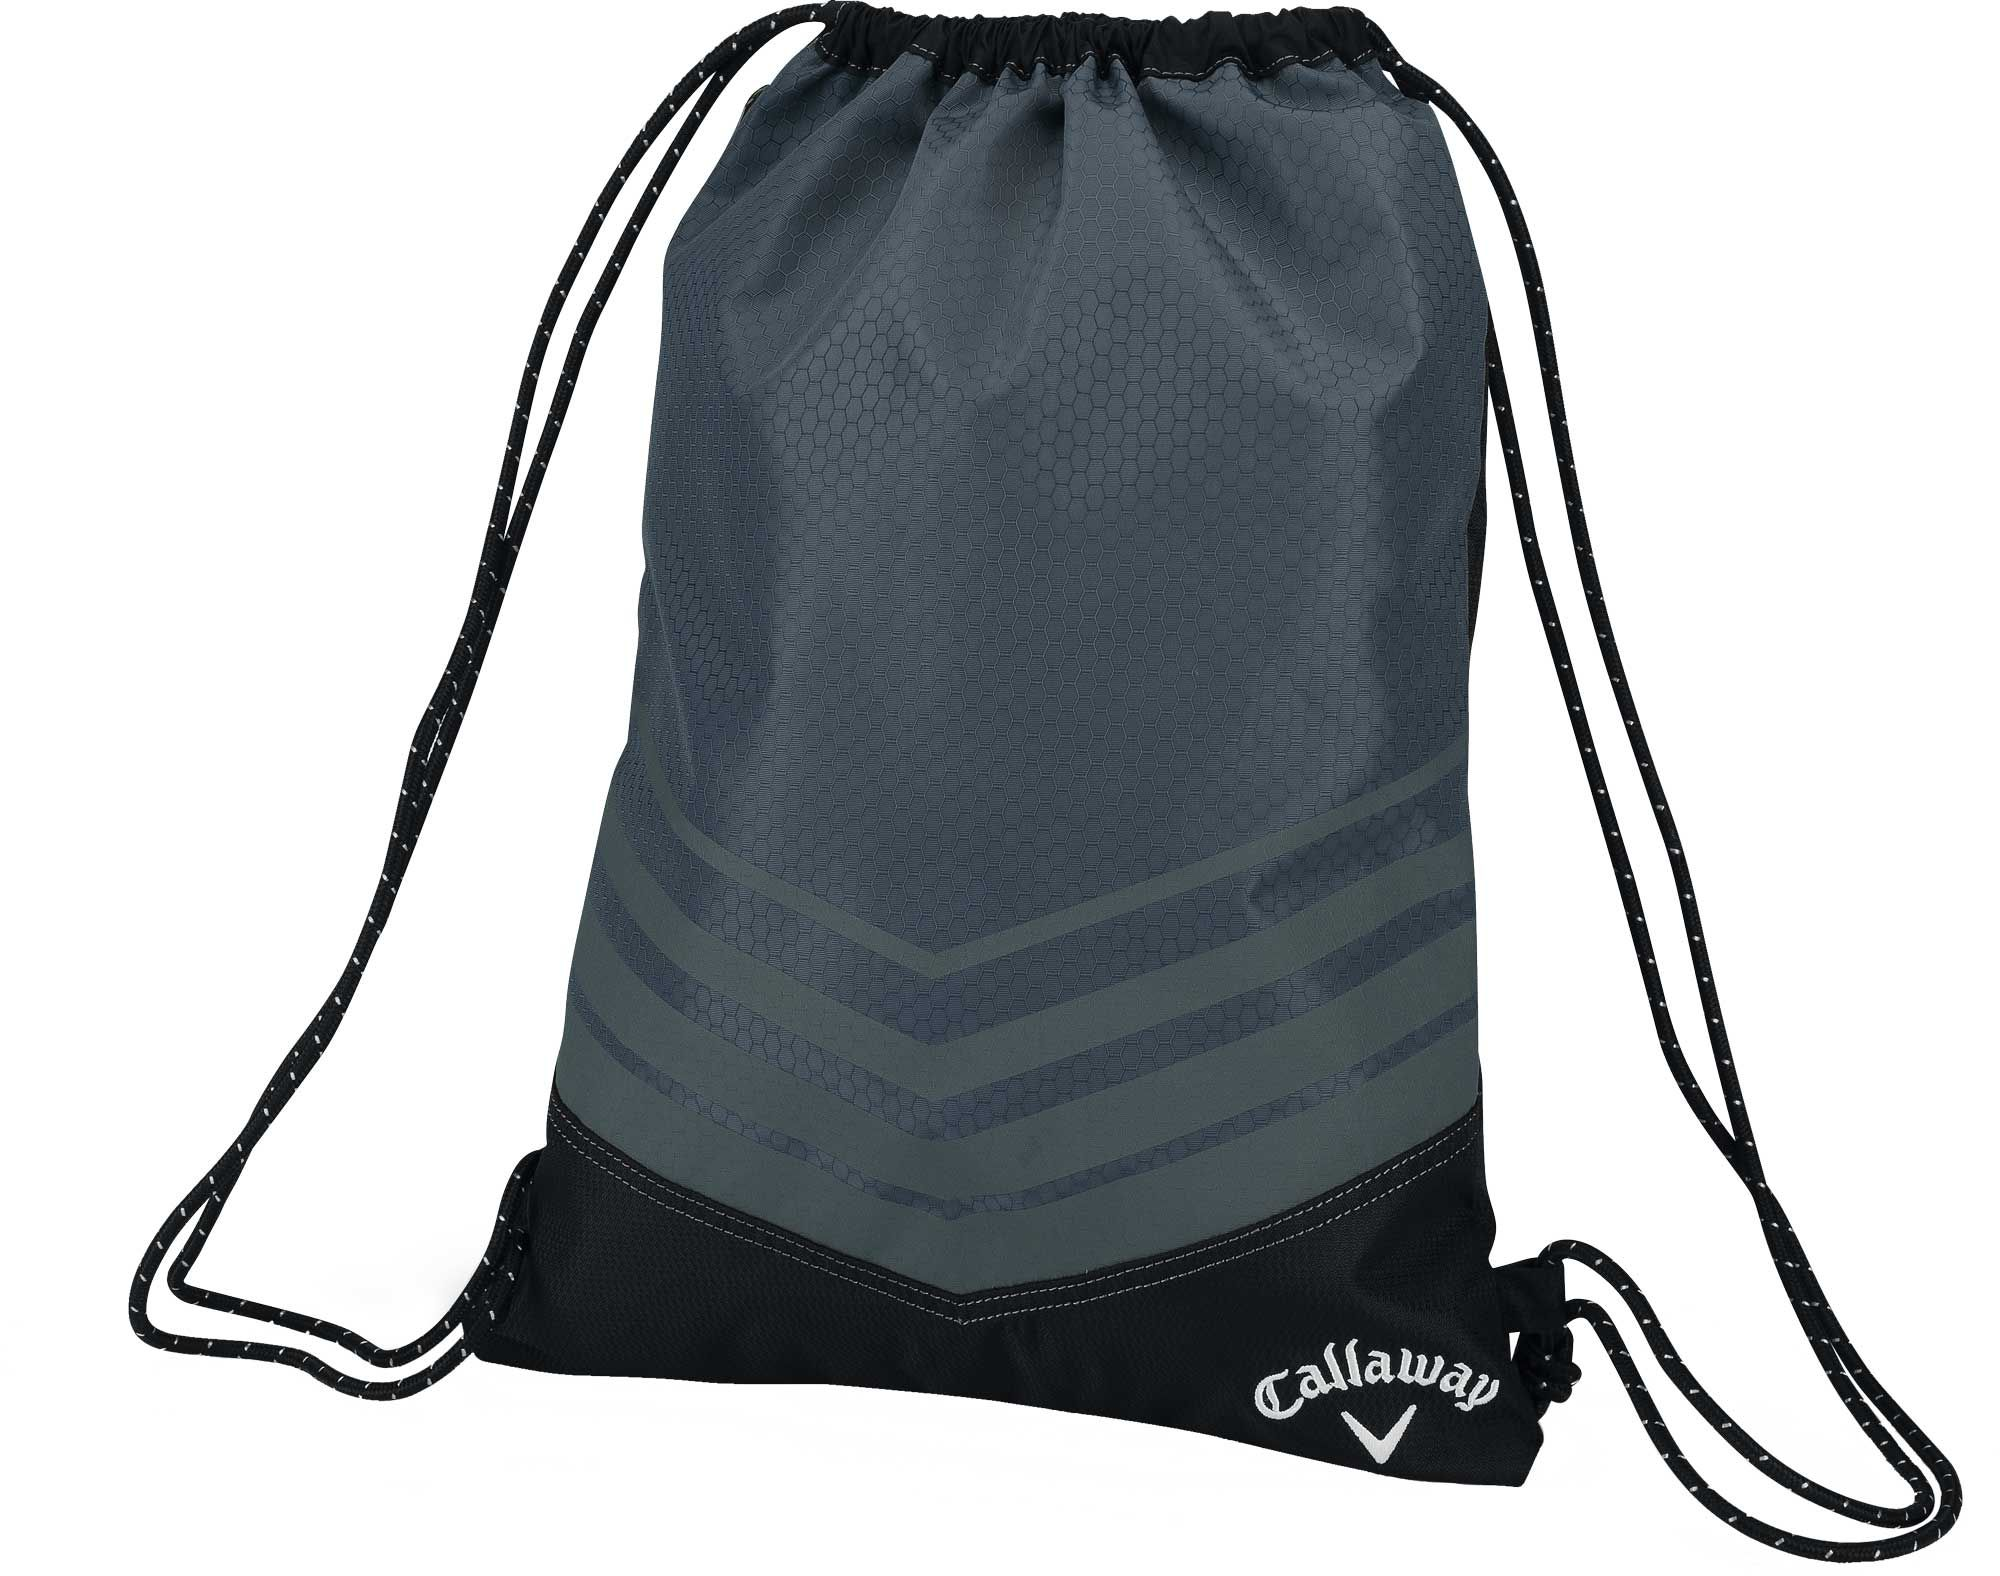 Golf Duffle Bags  Golf Tote Bags  Golf Galaxy